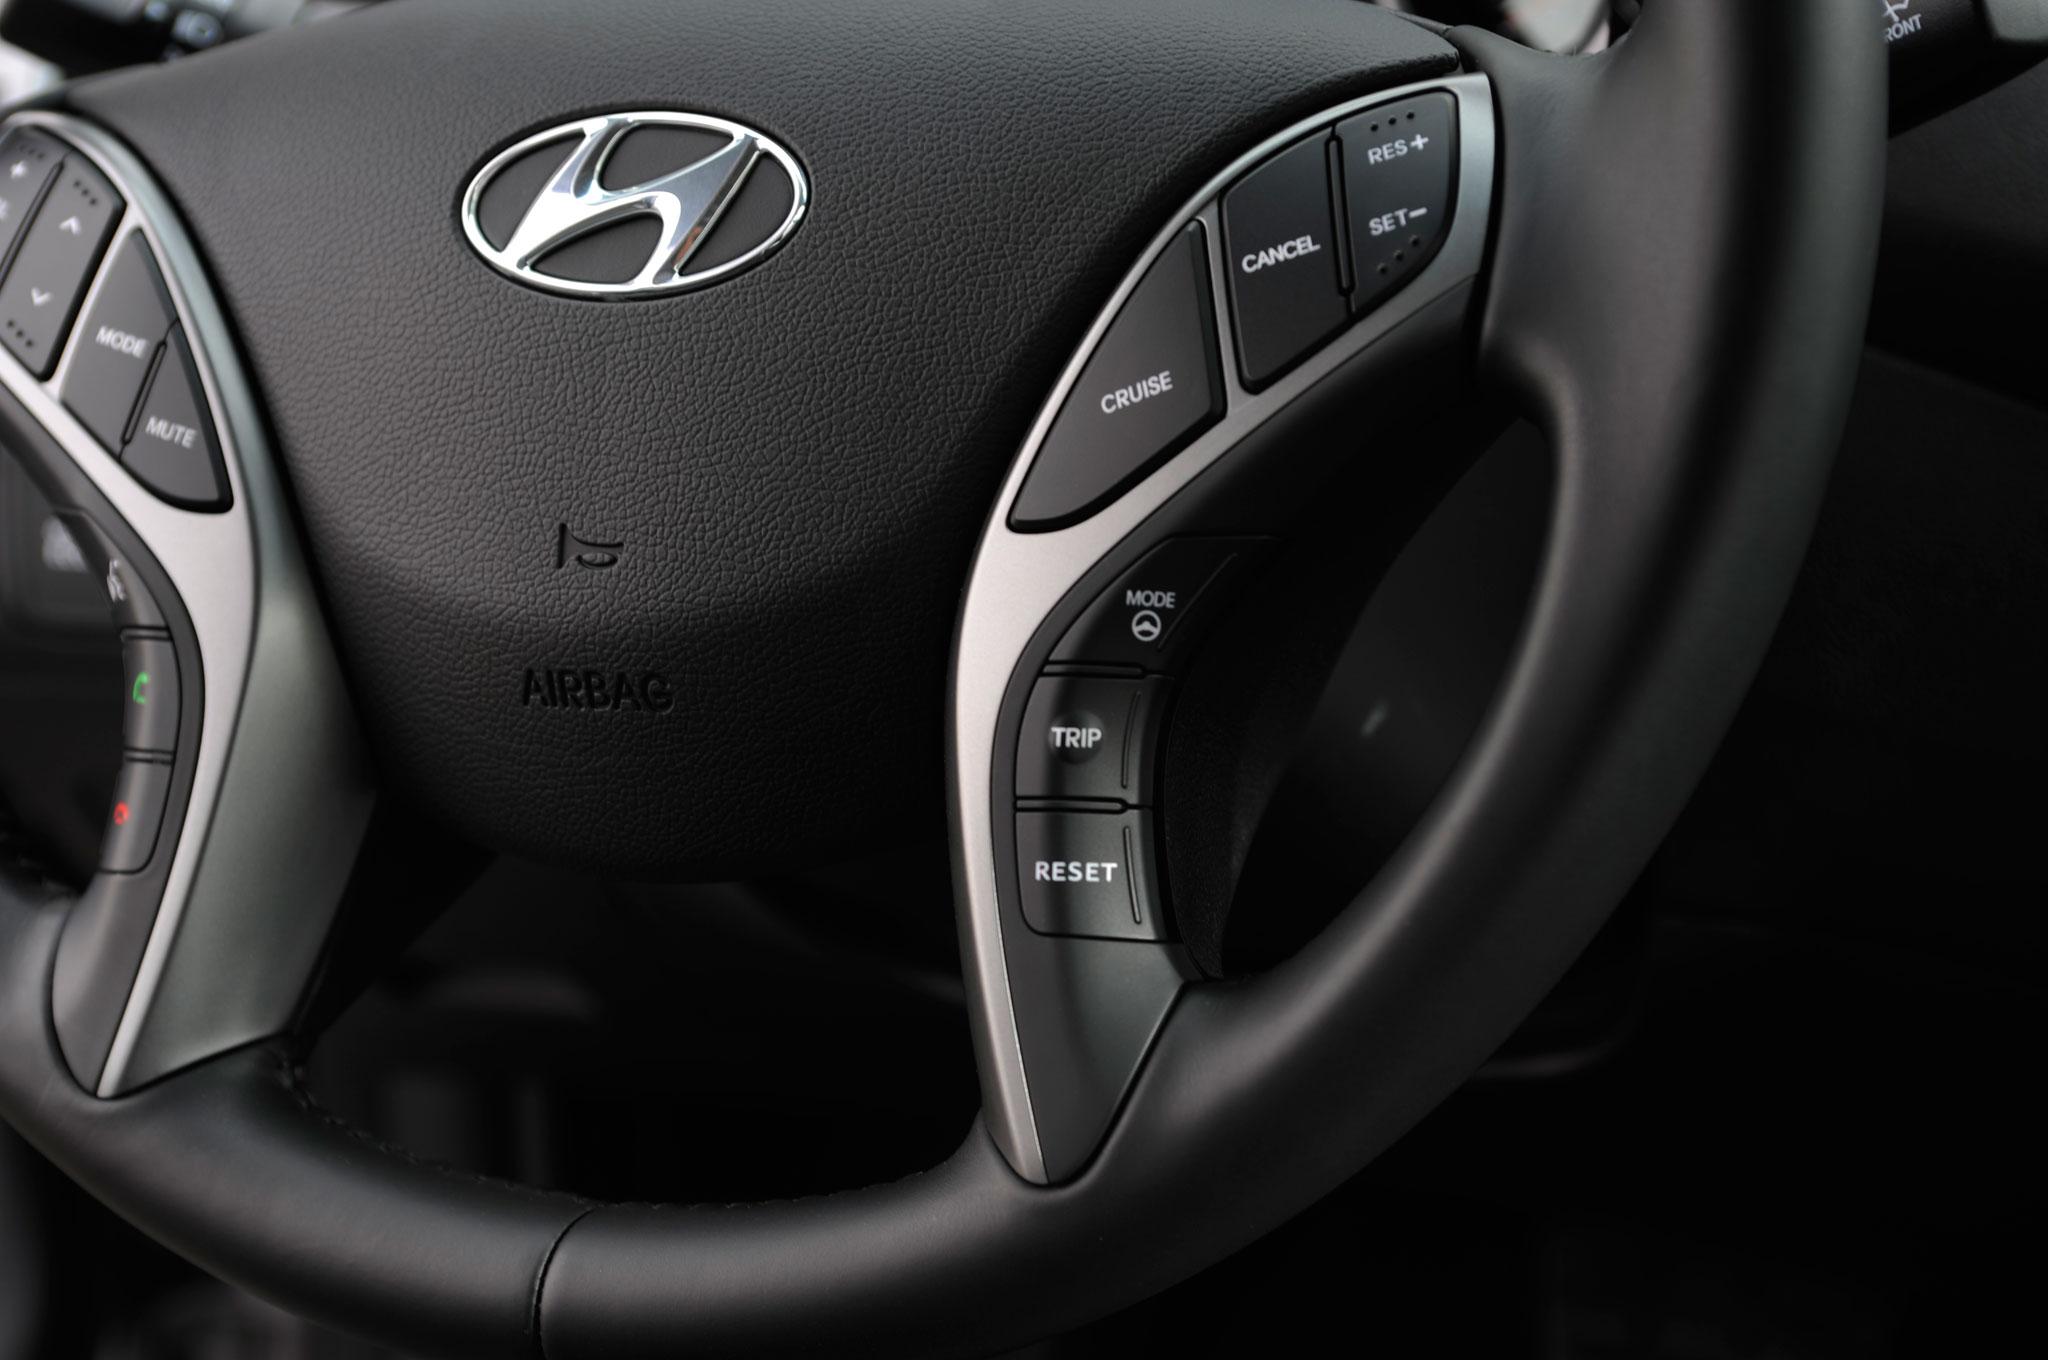 2014 Hyundai Elantra Refreshed At 2013 Los Angeles Auto Show